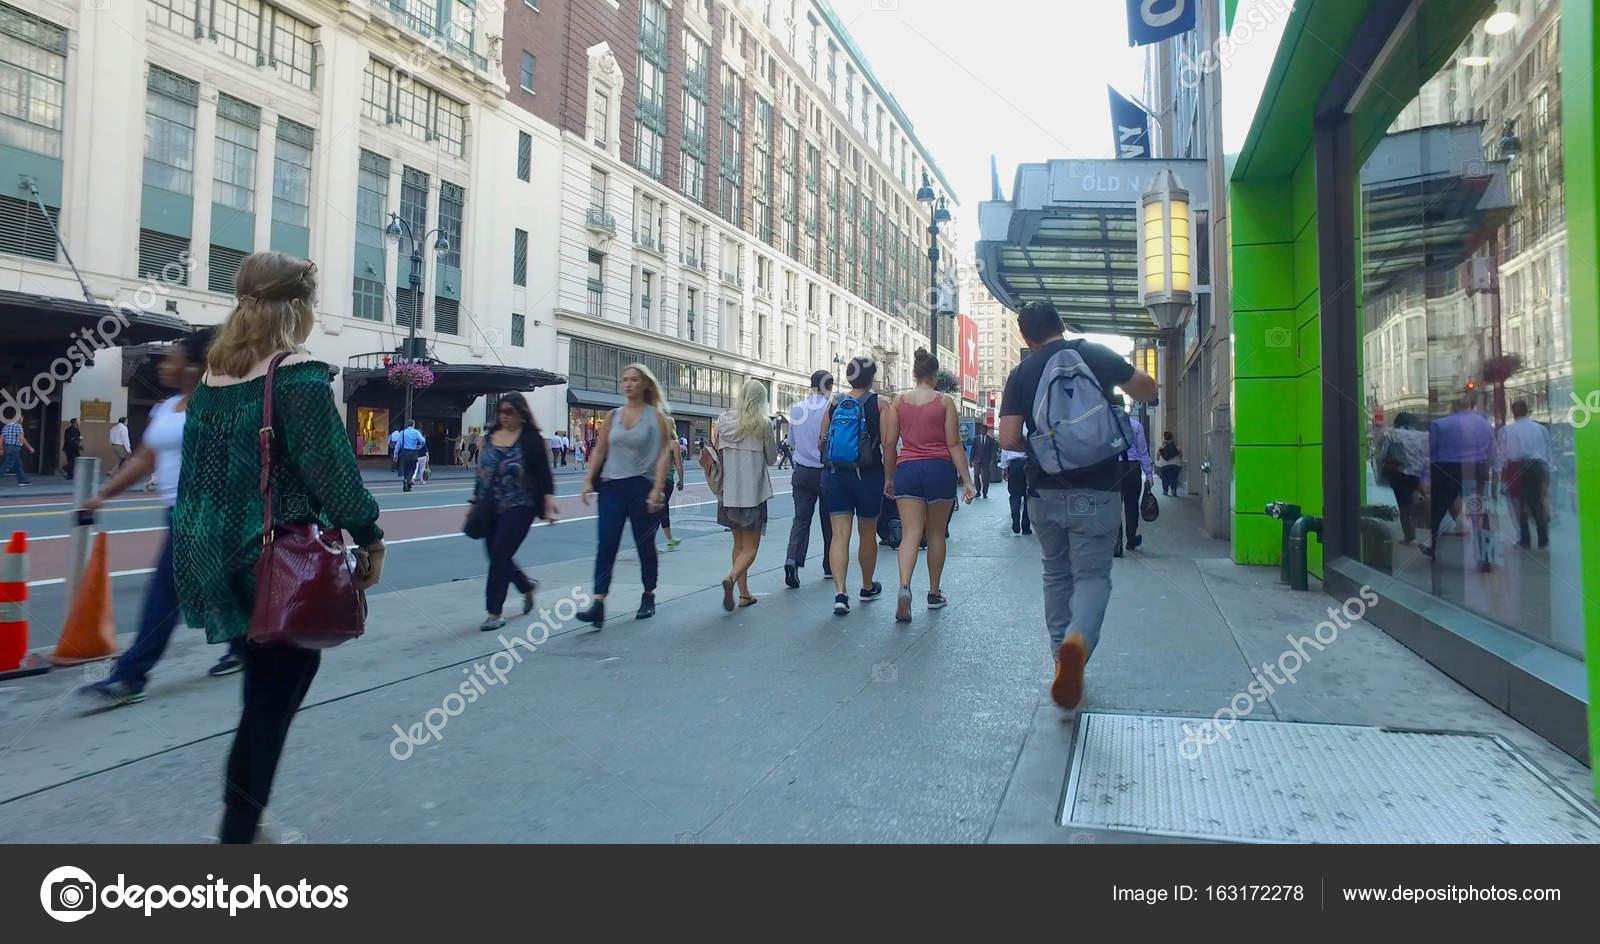 photo How to Walk Down a Sidewalk